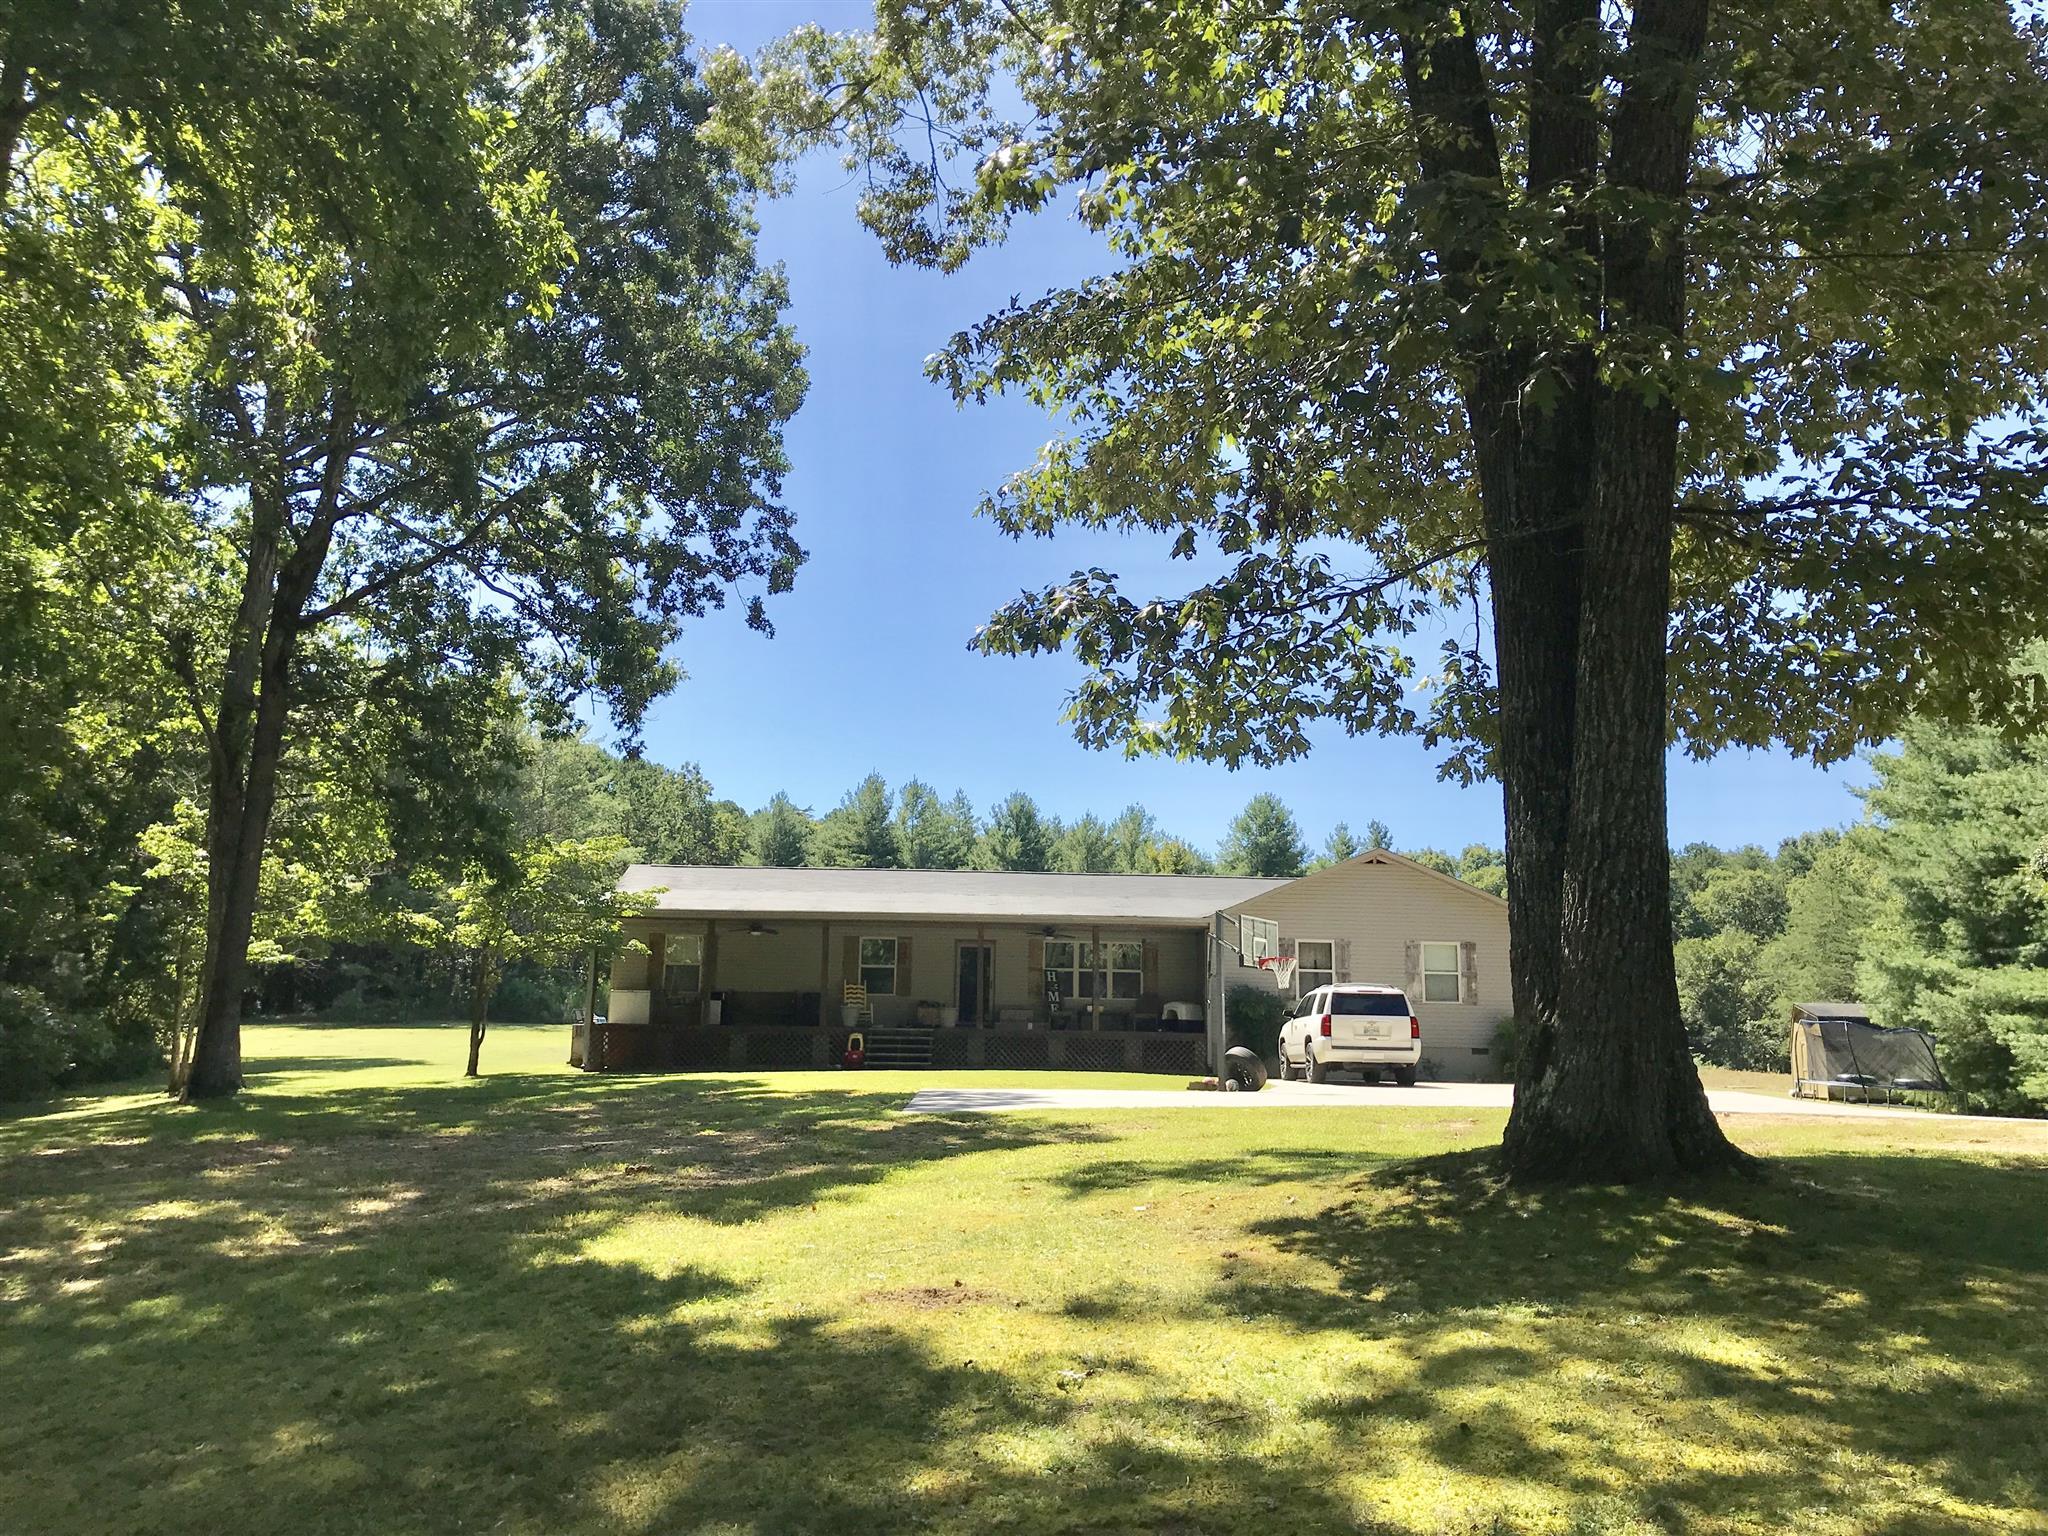 566 Ranger Creek Rd, Coalmont, TN 37313 - Coalmont, TN real estate listing